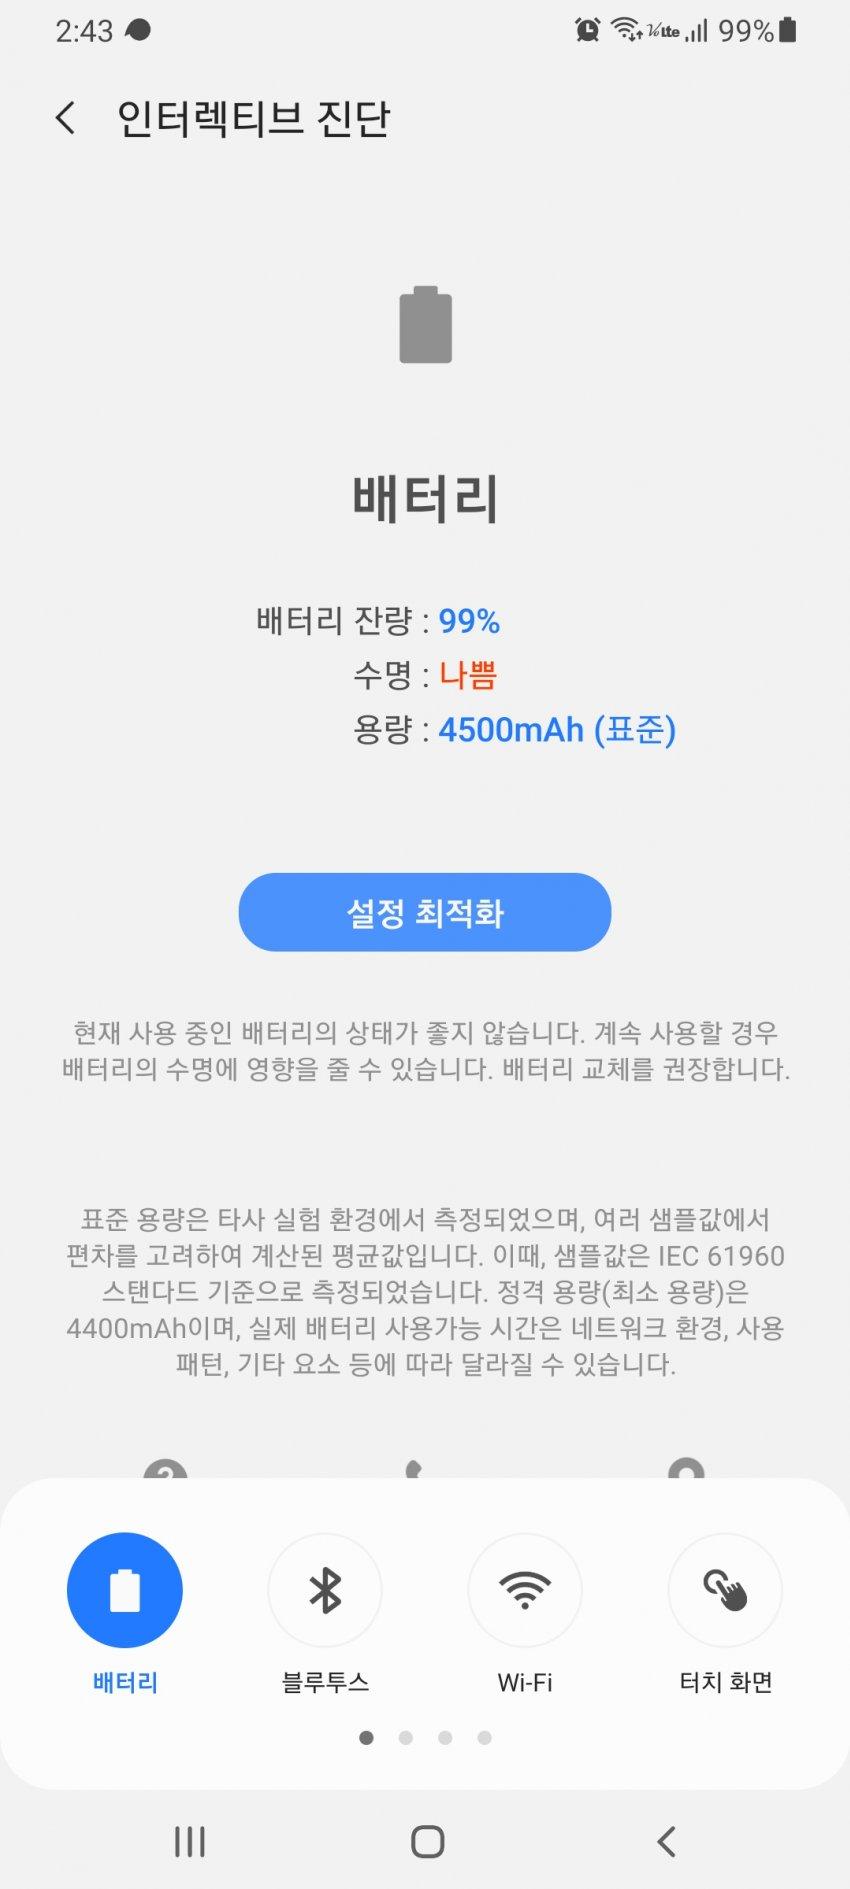 viewimage.php?id=3ebcdd35f0dc3fa1&no=24b0d769e1d32ca73dec8efa11d02831b210072811d995369f4ff39c9dd24d83c17af7a00c8de4f860d969dd75f3c8f1ce7fb51c2c01509b5bbdd9a026dea5163ee41f00ceaffeb253109b447bdd4f9bc46e07344a328003f659b5214e7bad314e0141175120ead305d8b655cc